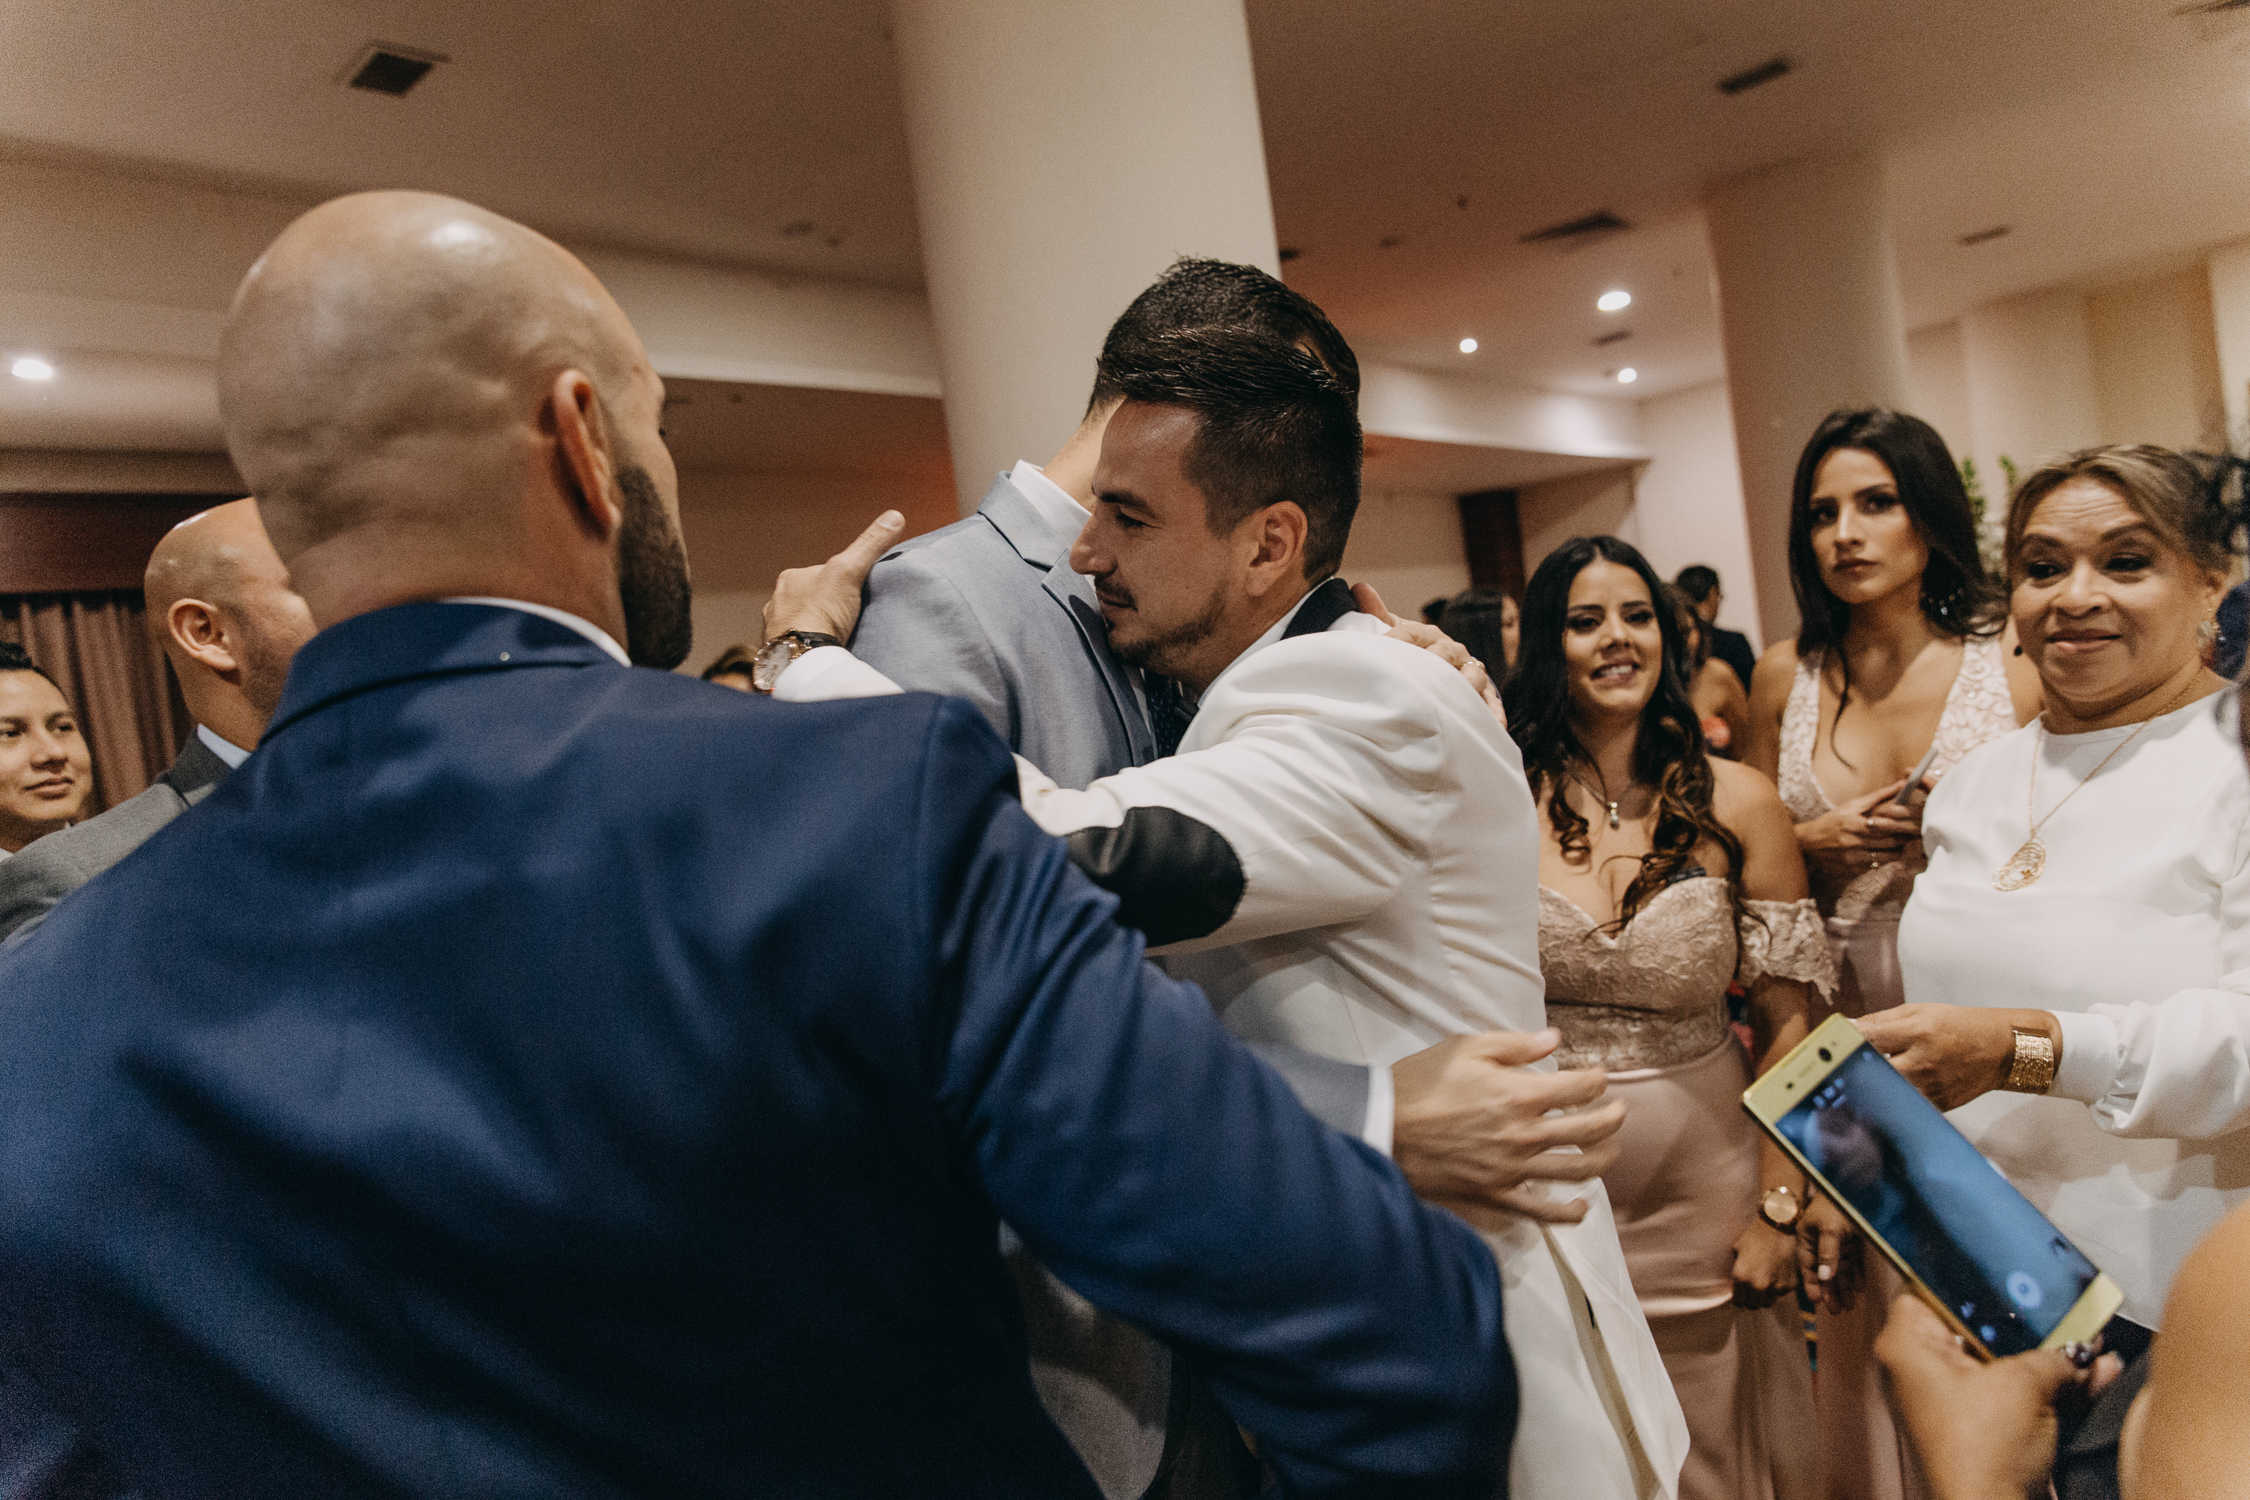 Michelle-Agurto-Fotografia-Bodas-Ecuador-Destination-Wedding-Photographer-Daniela-Dirk-55.JPG